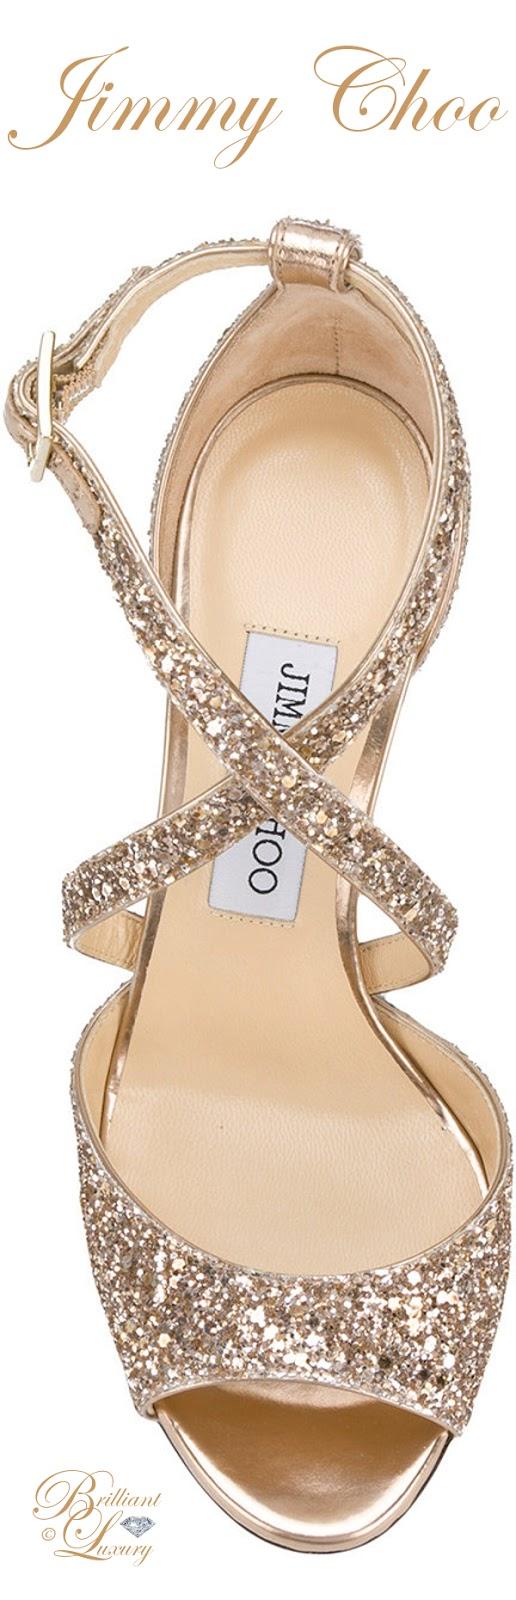 Brilliant Luxury ♦  Jimmy Choo Carrie sandals